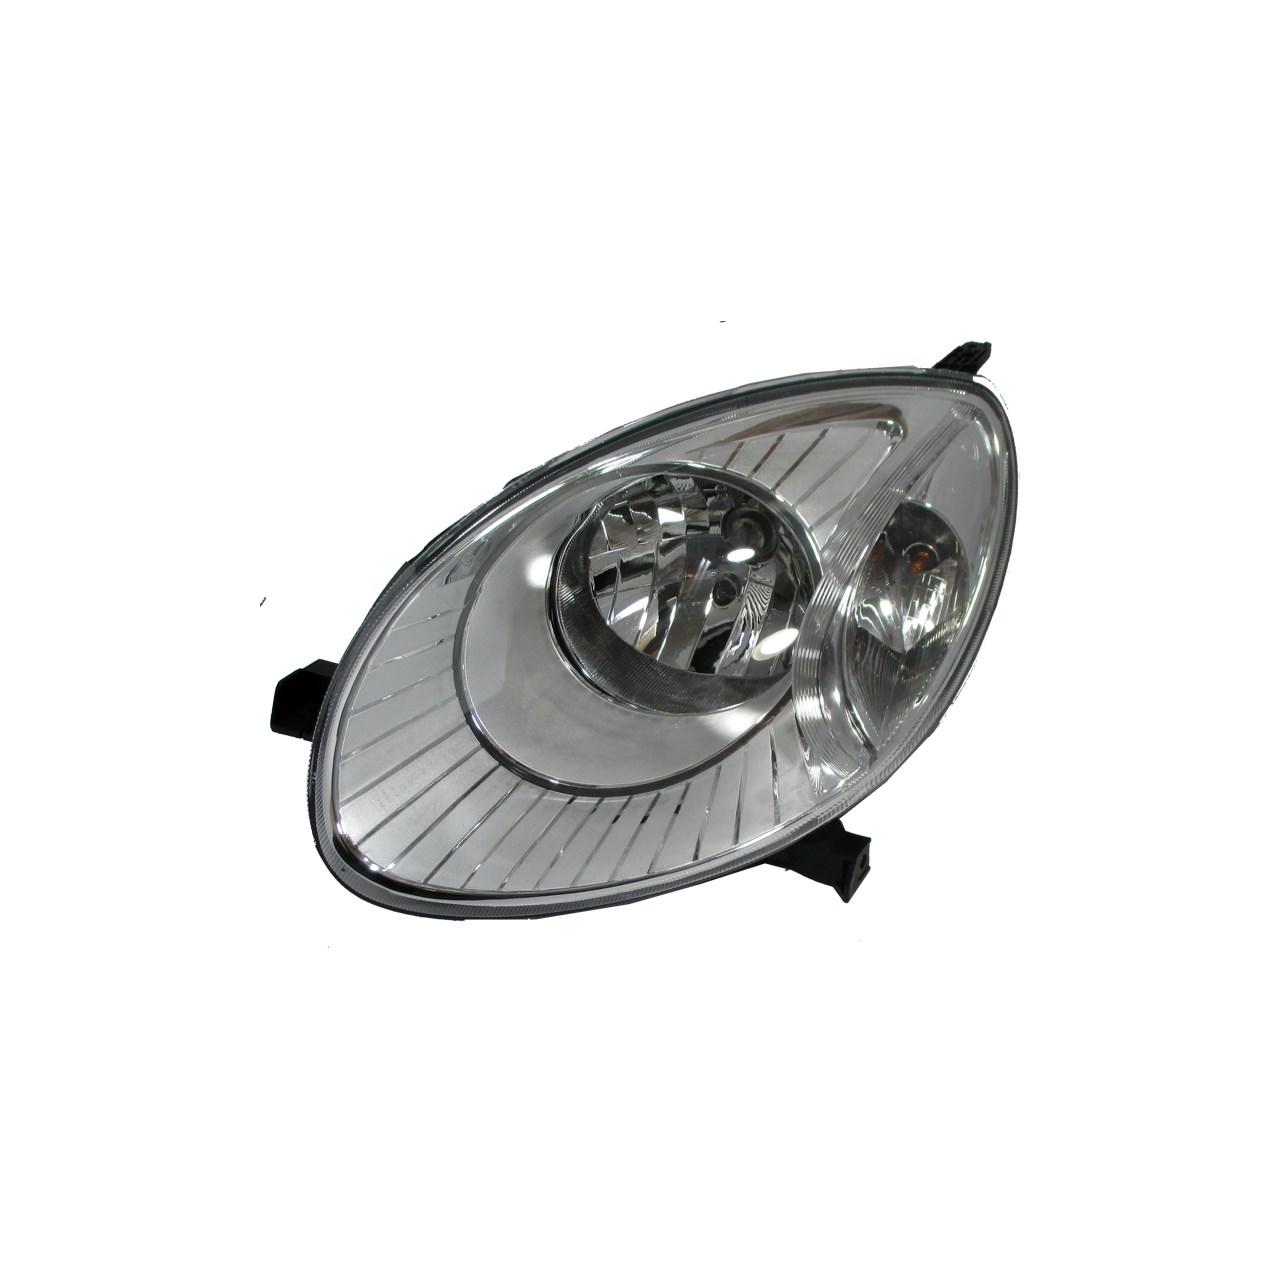 چراغ جلو چپ ام وی ام 110 S مدل J00-4421010